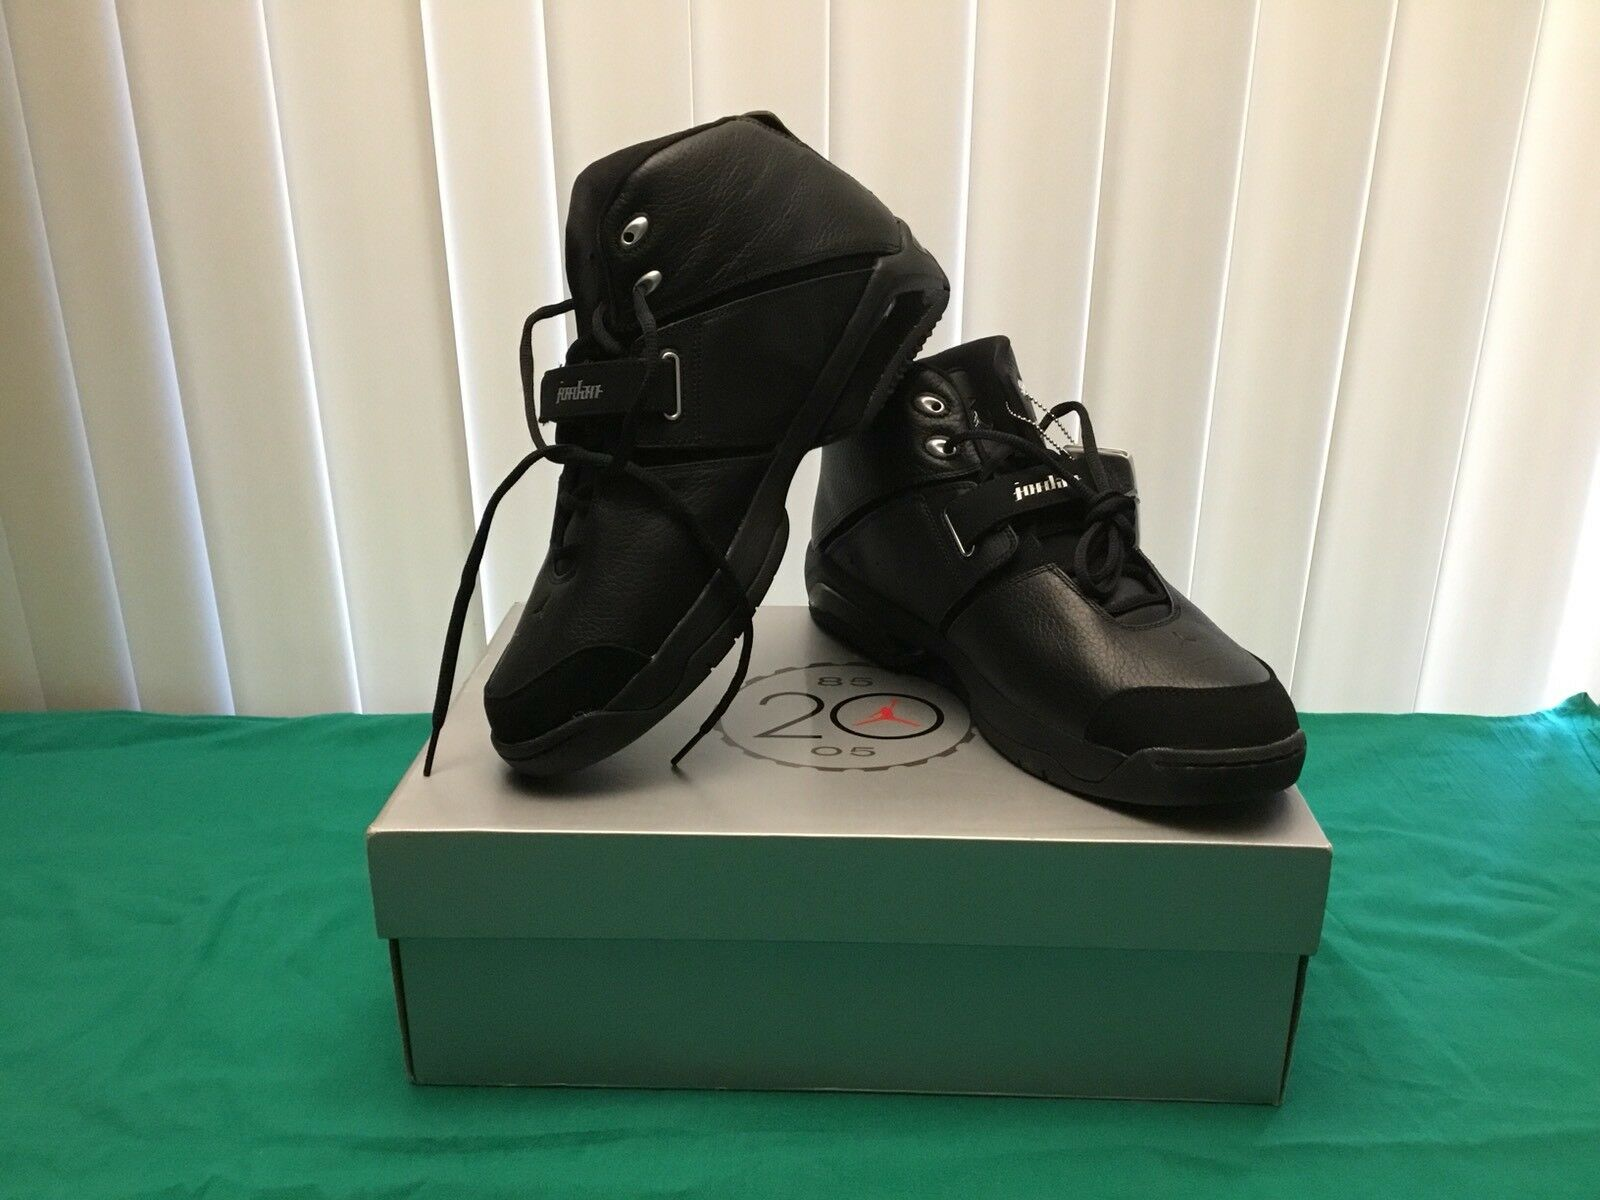 Jordan Team Reign NEGRO METALIZADO PLATA negro argment tamaño 11.5 Zapatos 311833-001